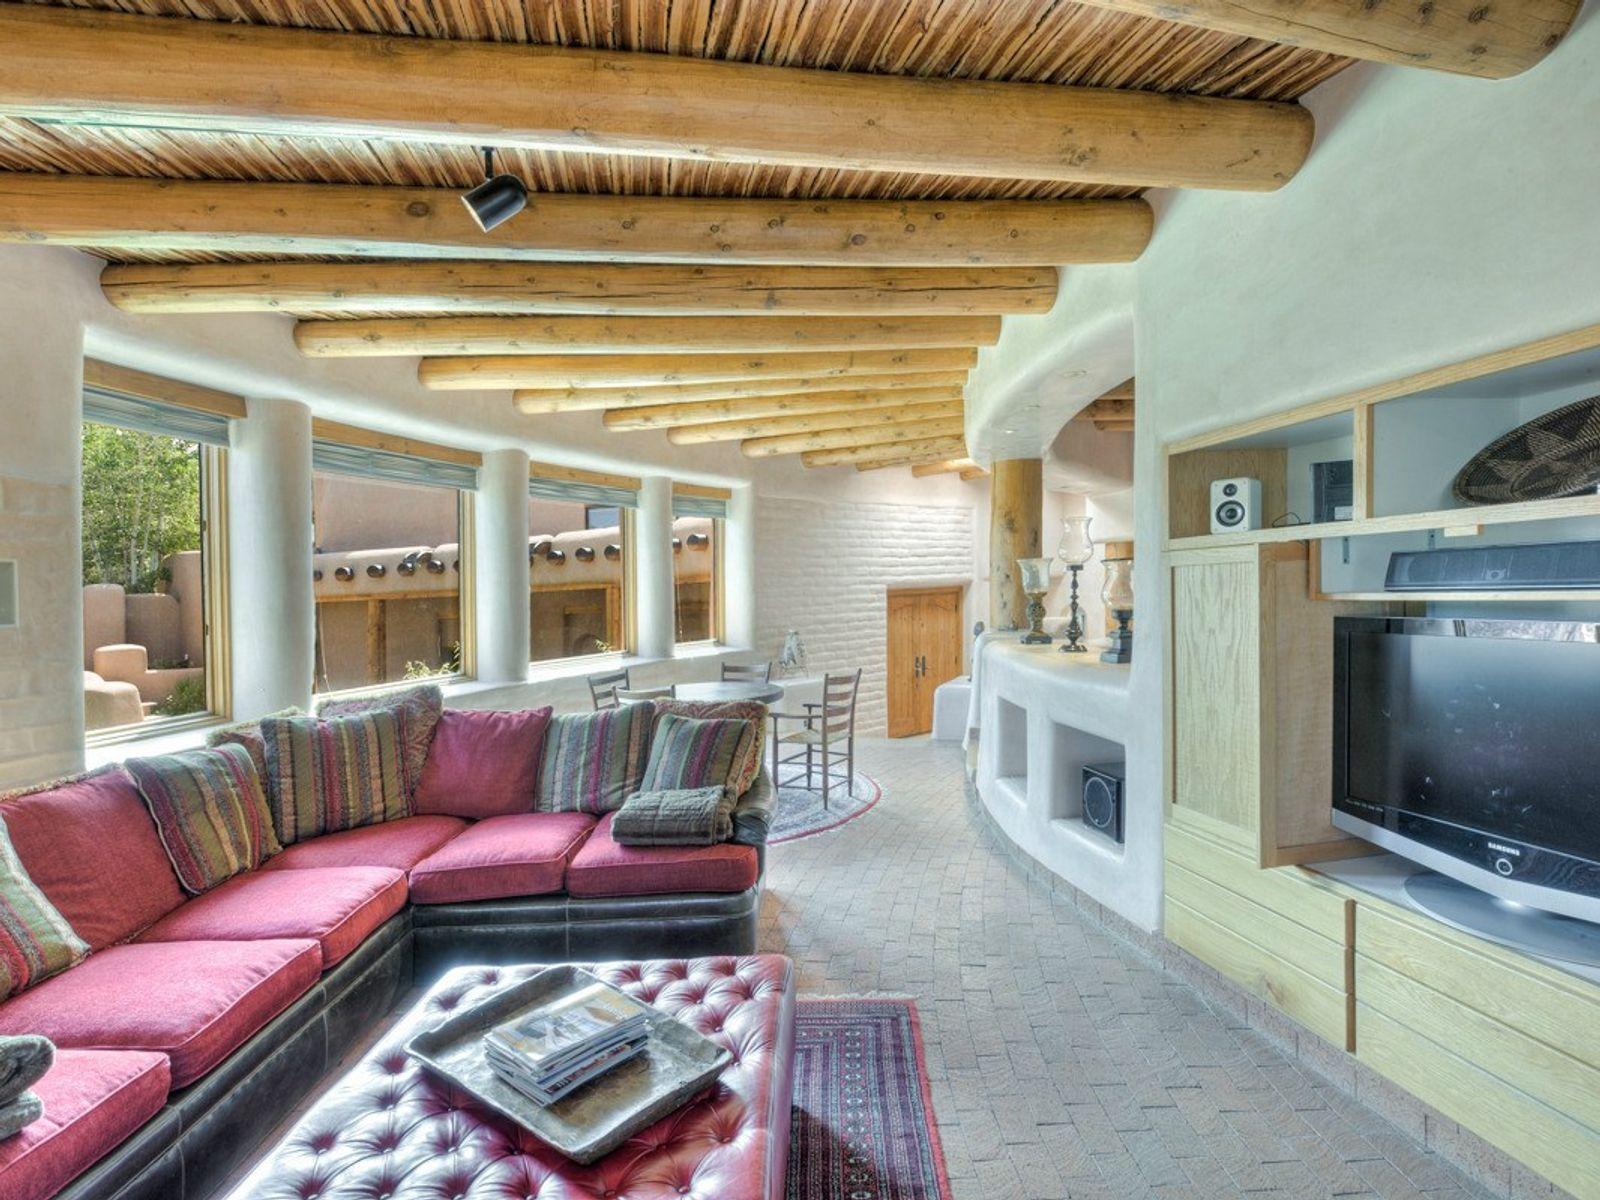 Stunning Adobe Home